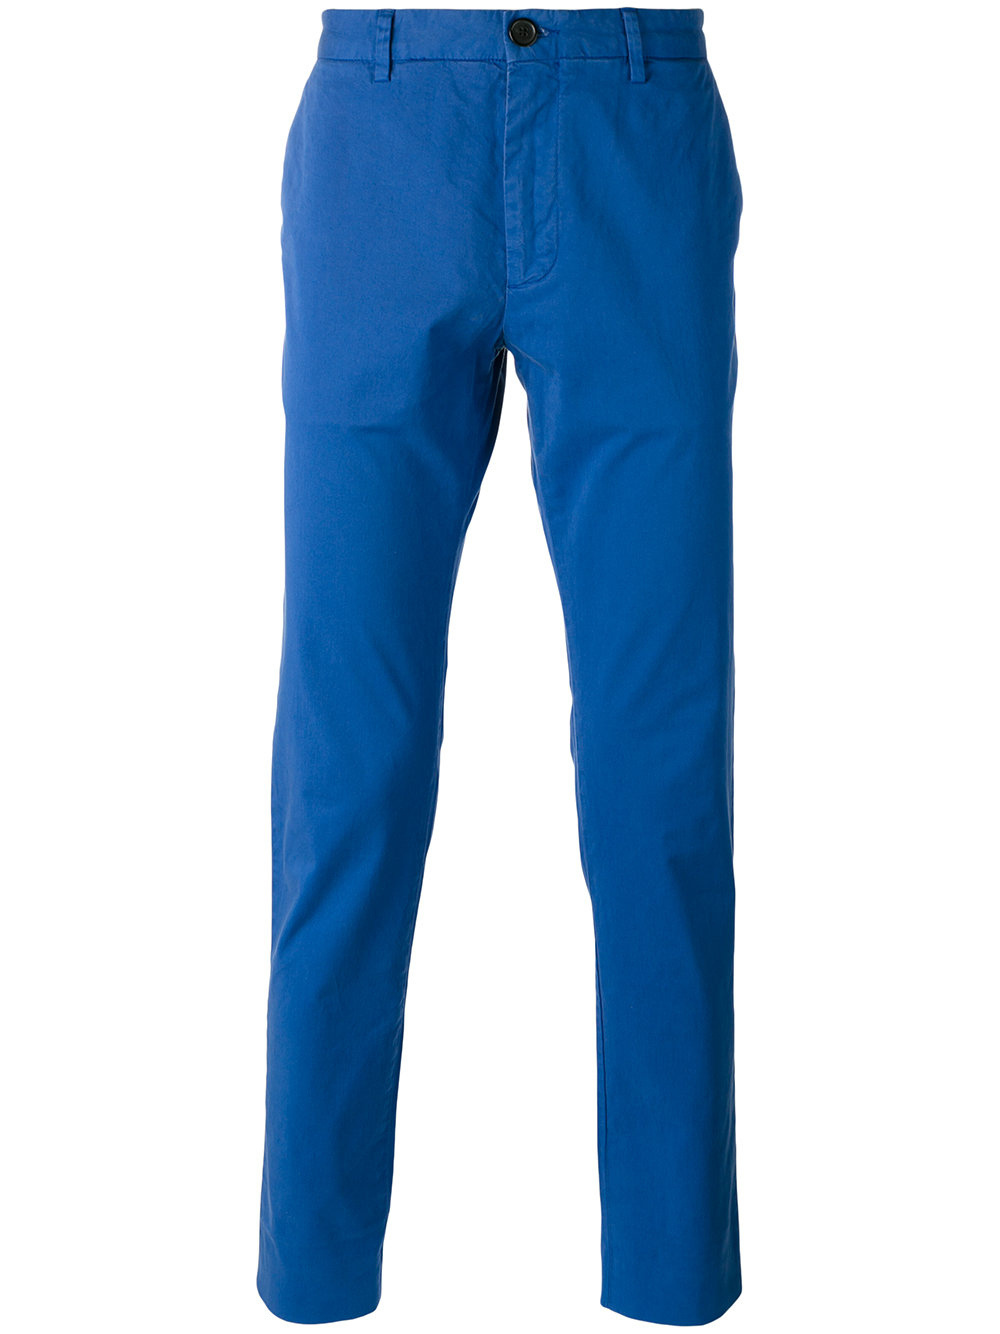 chakras-connected-to-fashion-blue-farfetch.jpg